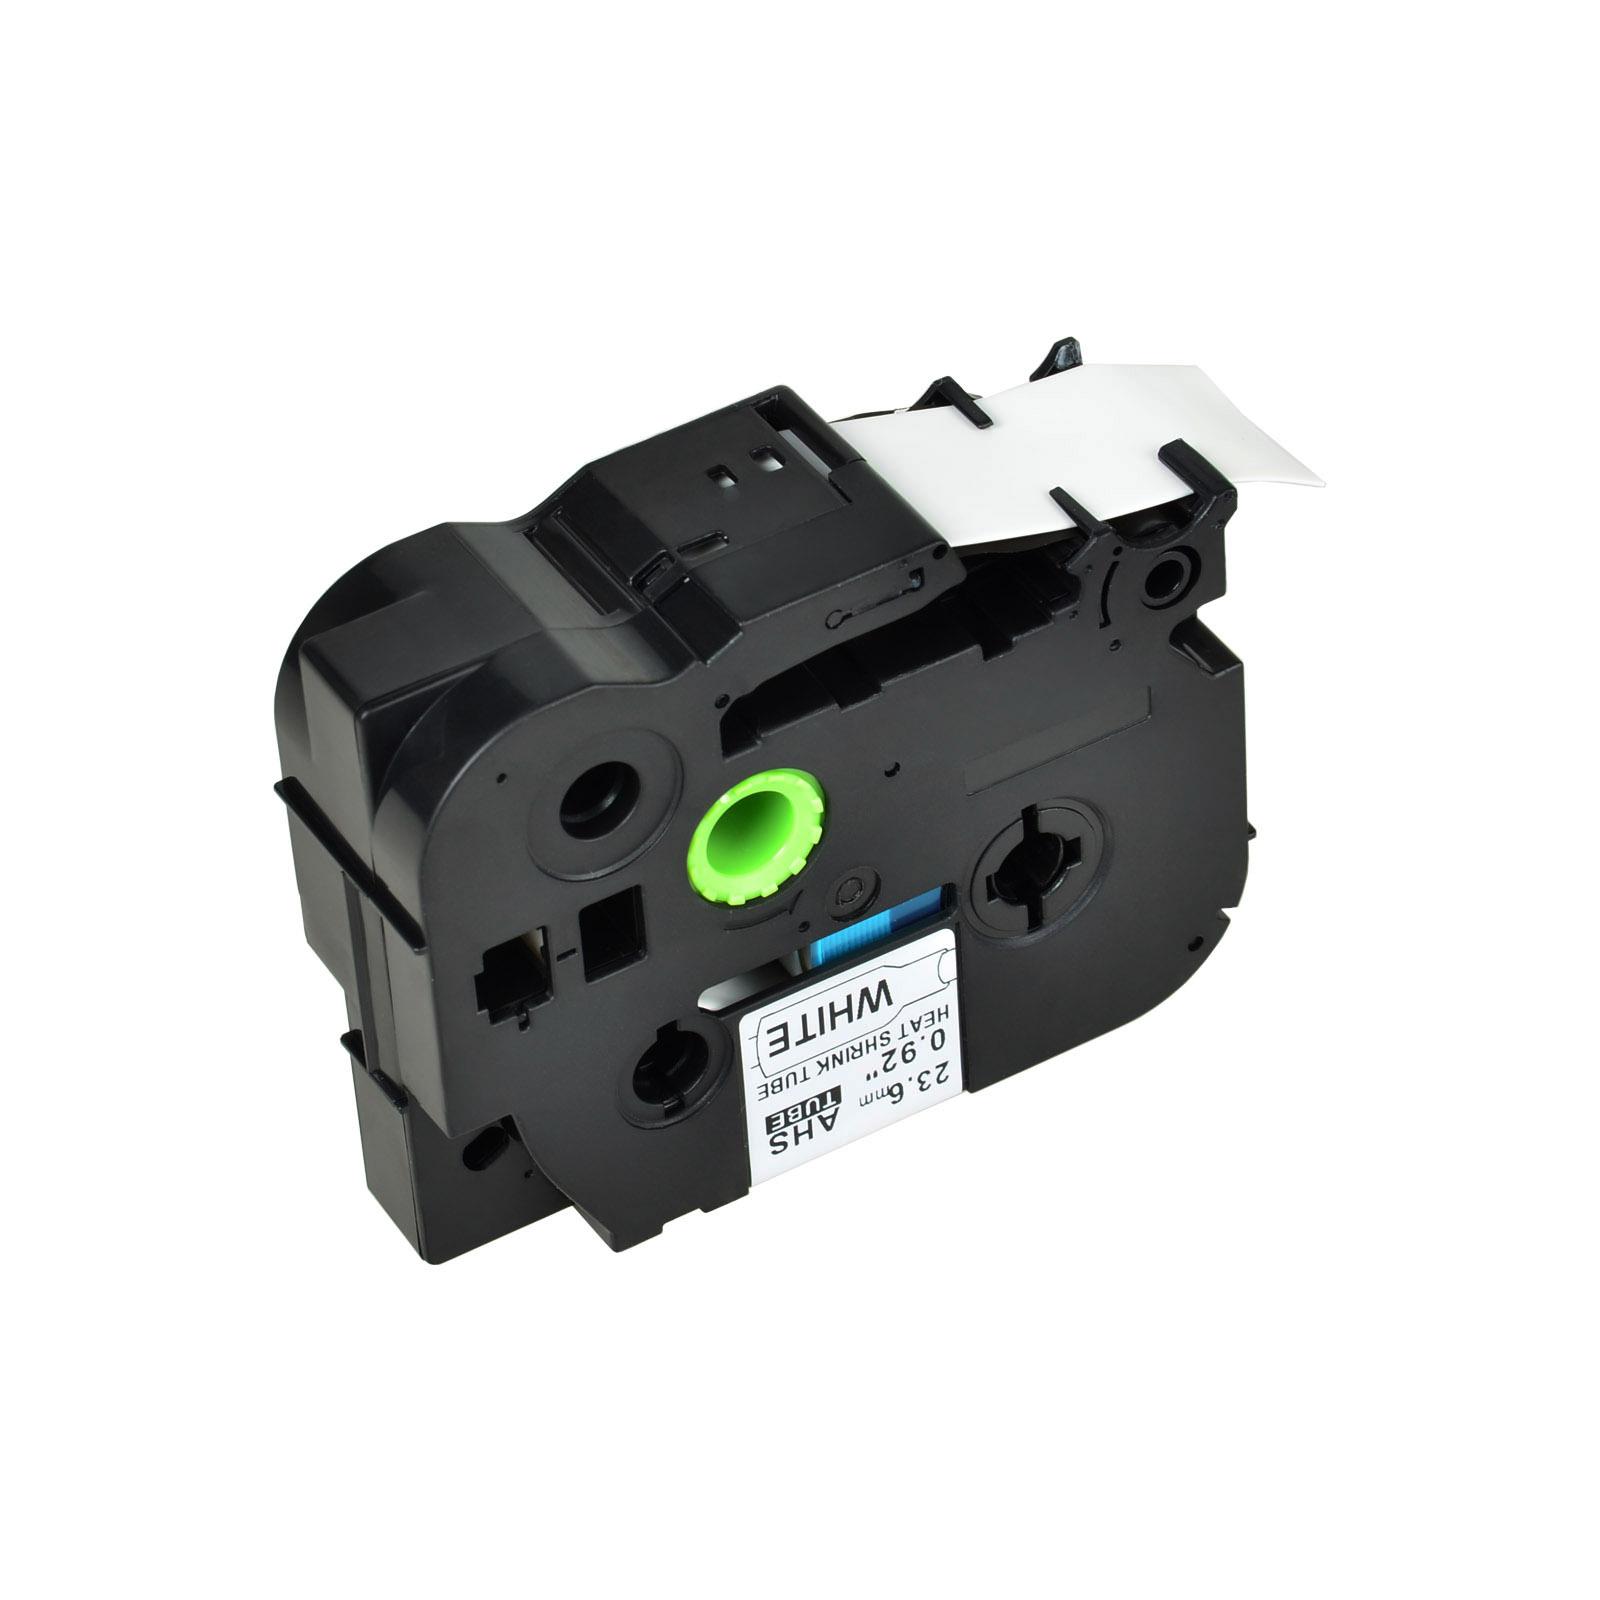 2 PK HSe251 Heat Shrink Tube Black on White Label for Brother PTE500VP 23.6mm